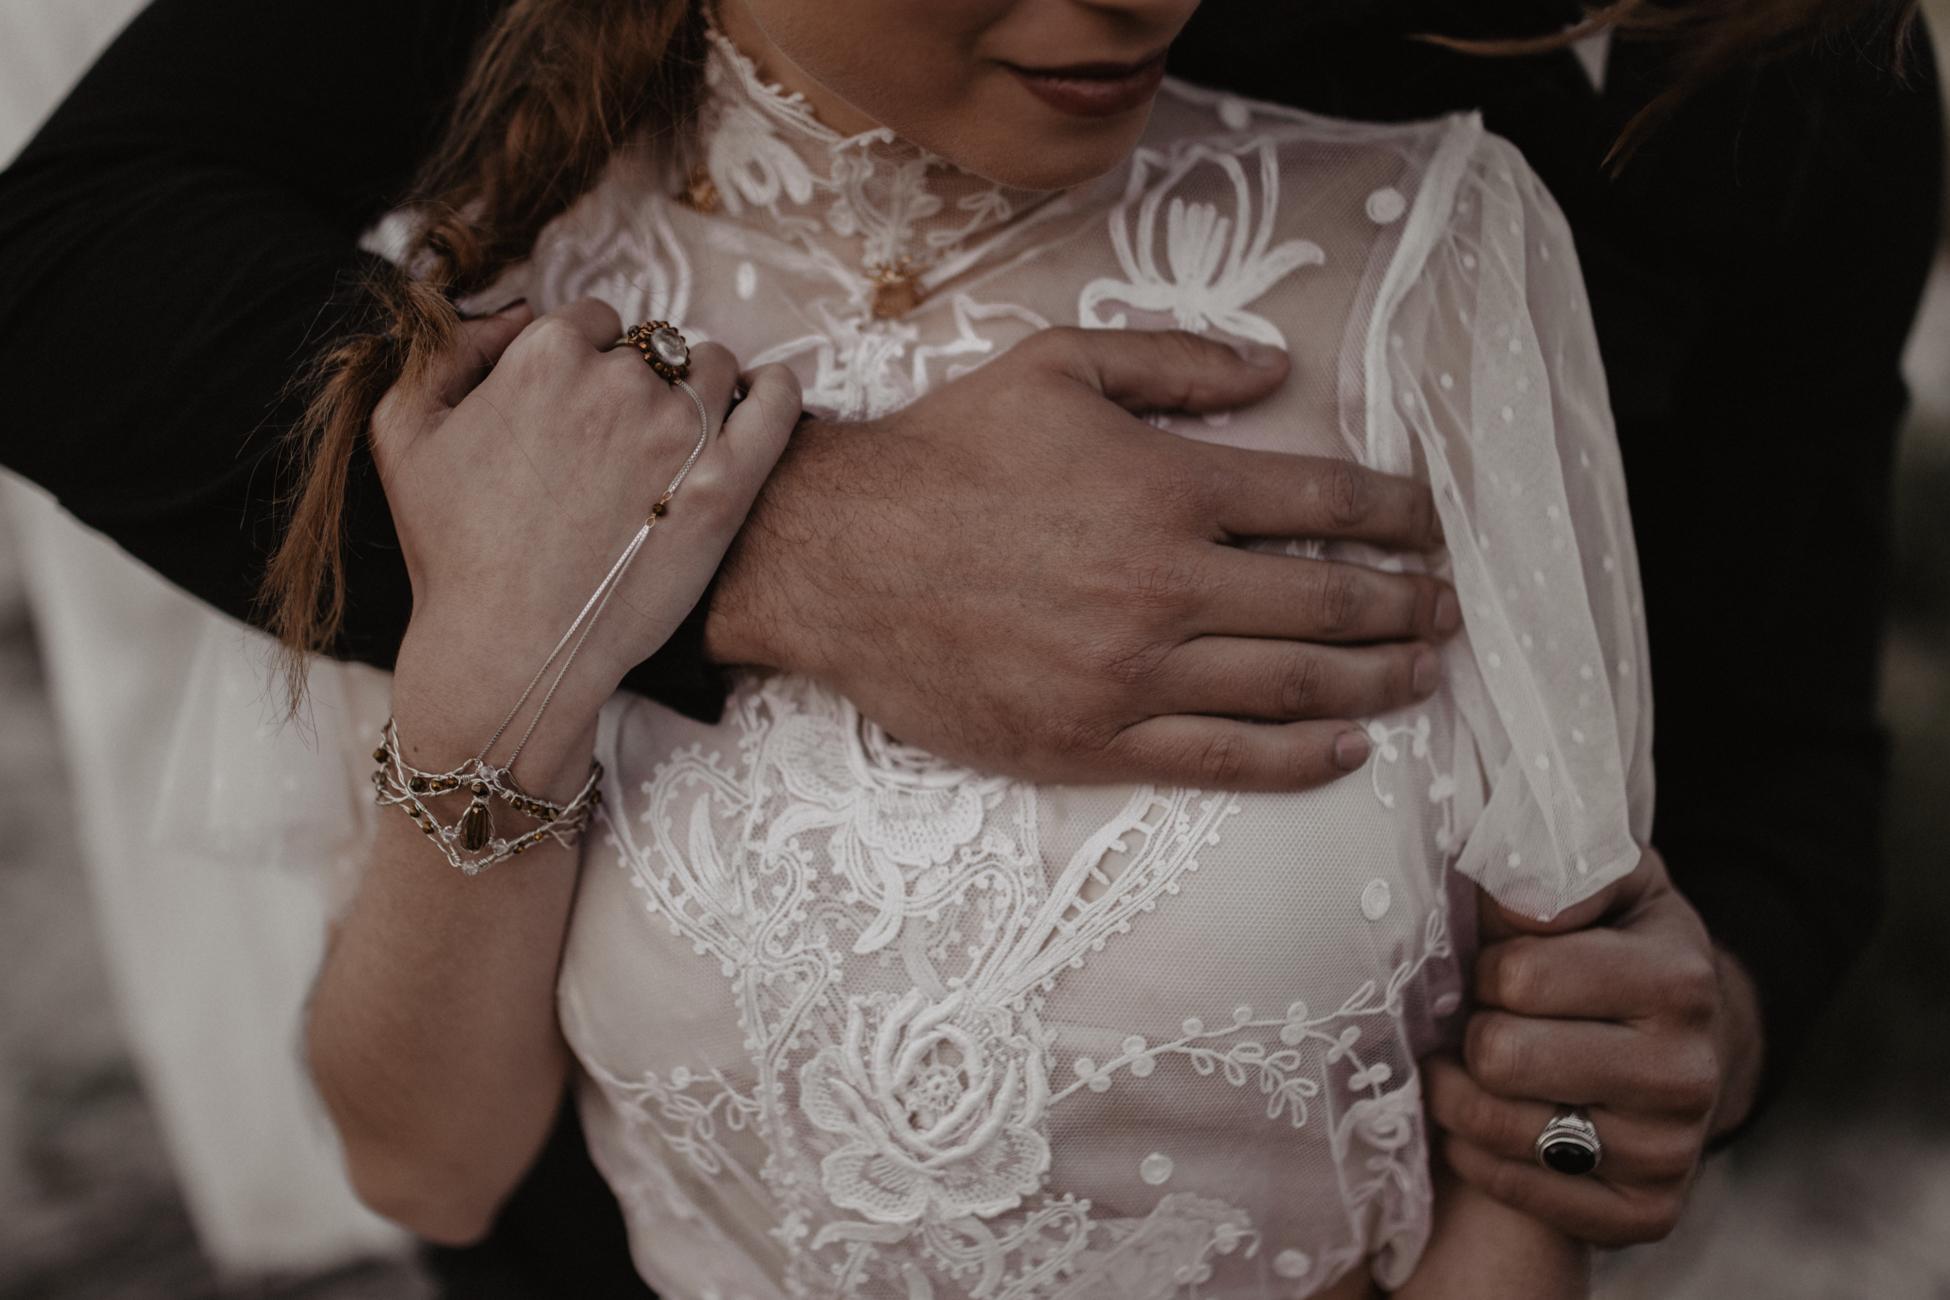 thenortherngirlphotography_photography_thenortherngirl_rebeccascabros_wedding_weddingphotography_weddingphotographer_wood_muebles_deco_bodasdecaramelo_home_bedtime_gaywedding_editorial_desierto_desert_wildestdreams_amortexano-406.jpg